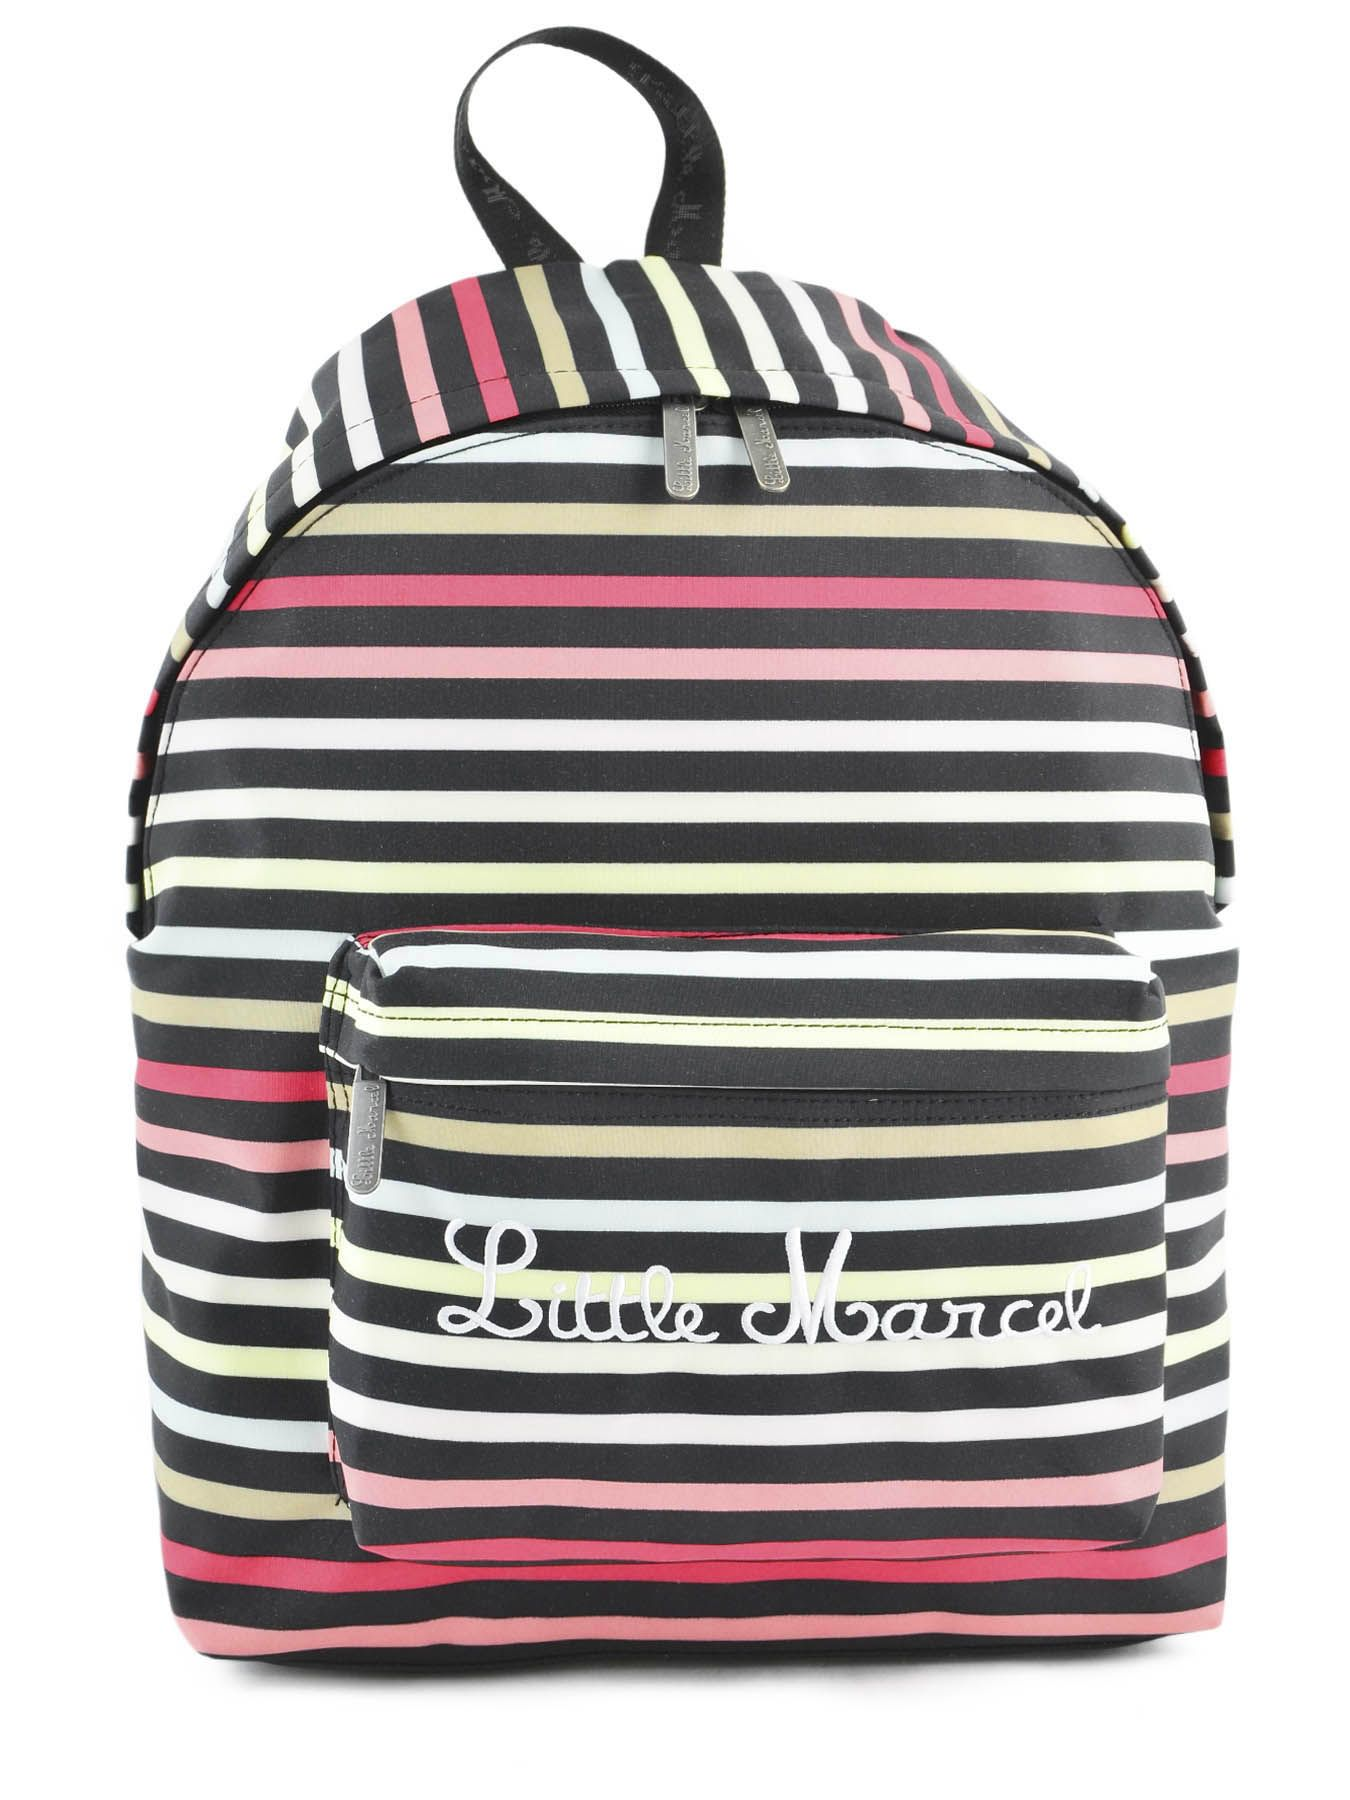 sac dos little marcel raye rose 279 school niby. Black Bedroom Furniture Sets. Home Design Ideas